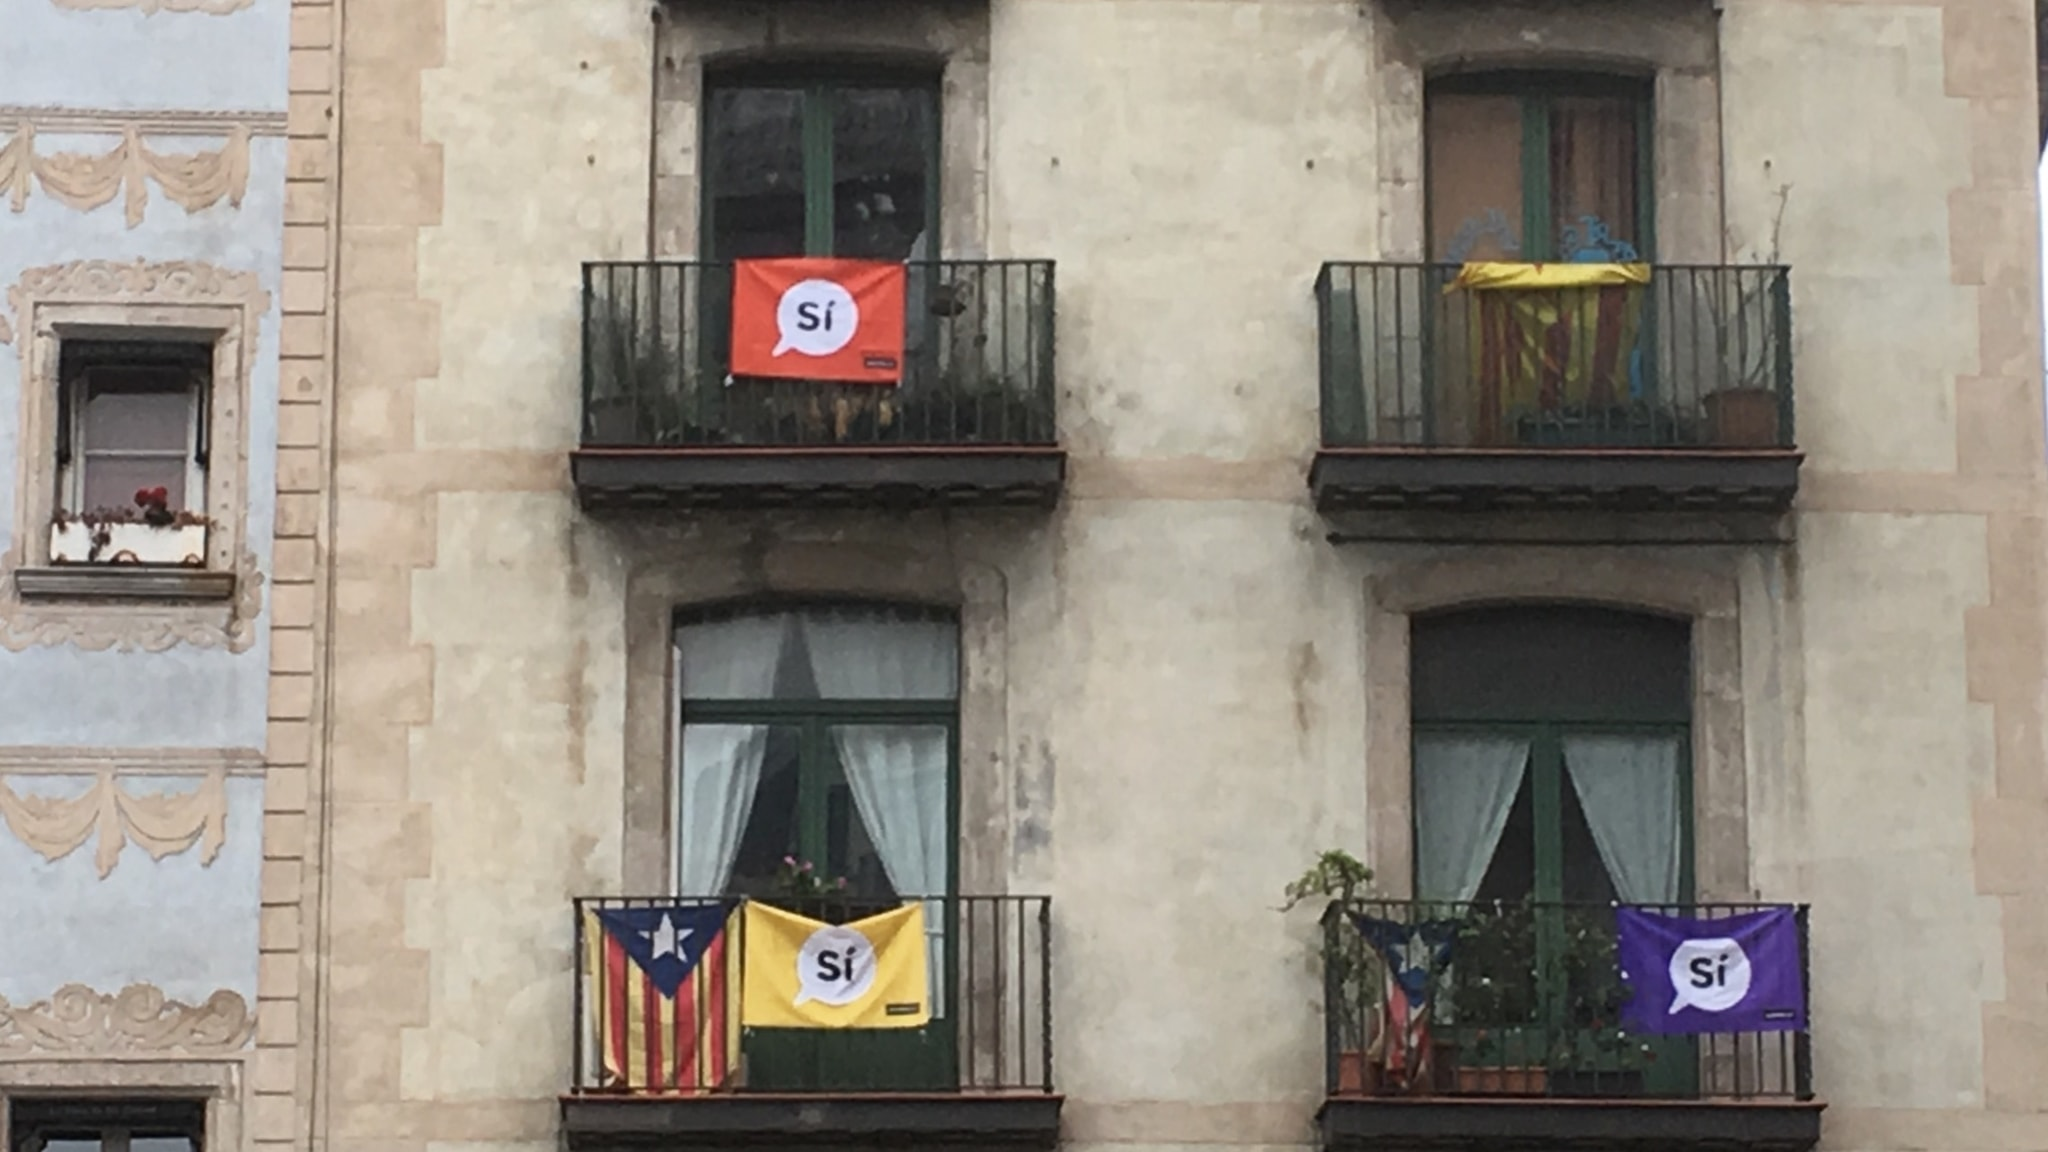 Fa katalaner rostar om oberoende